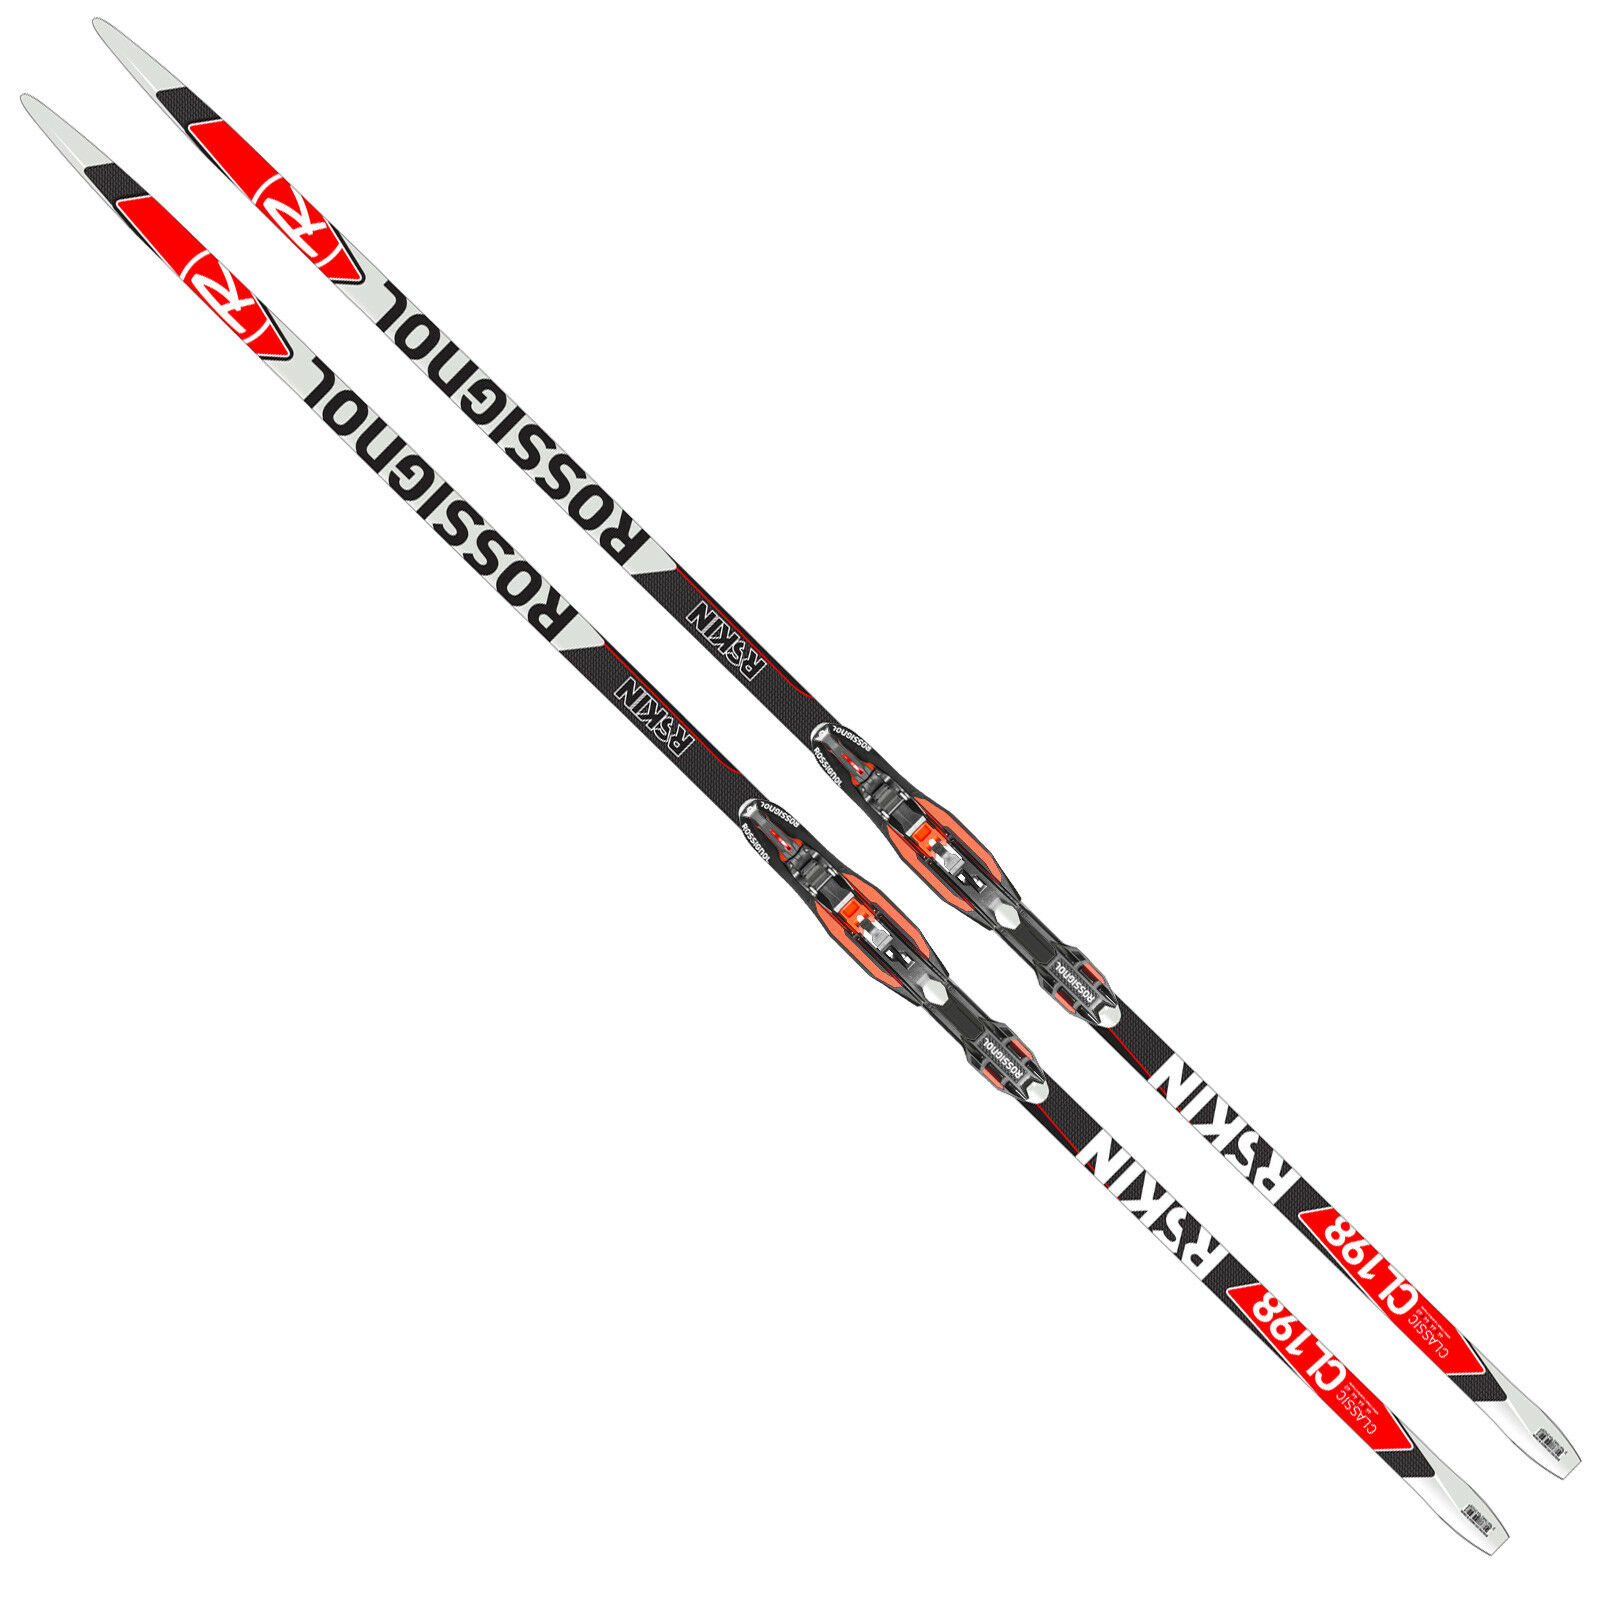 Rossignol R-Skin Ifp Unisex-Langlaufski Includes Race Classic Binding Ski-Set